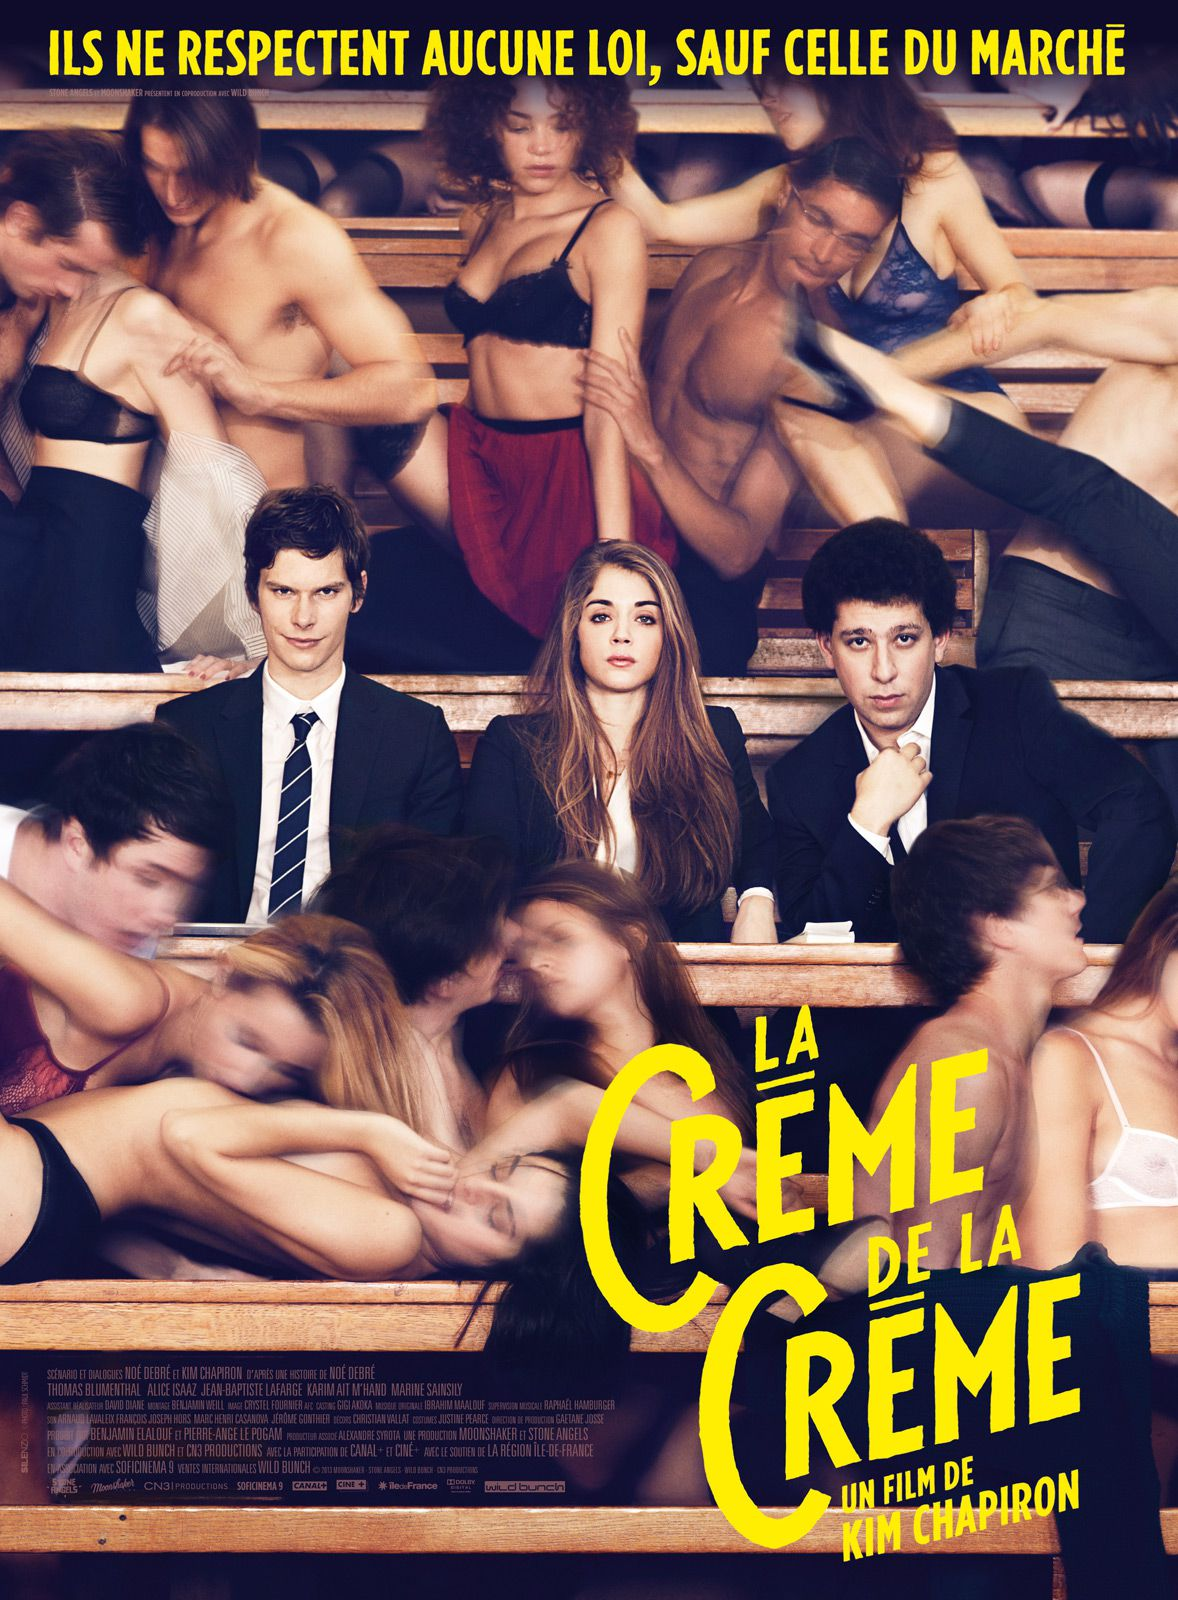 La Crème de la crème - Film (2014)